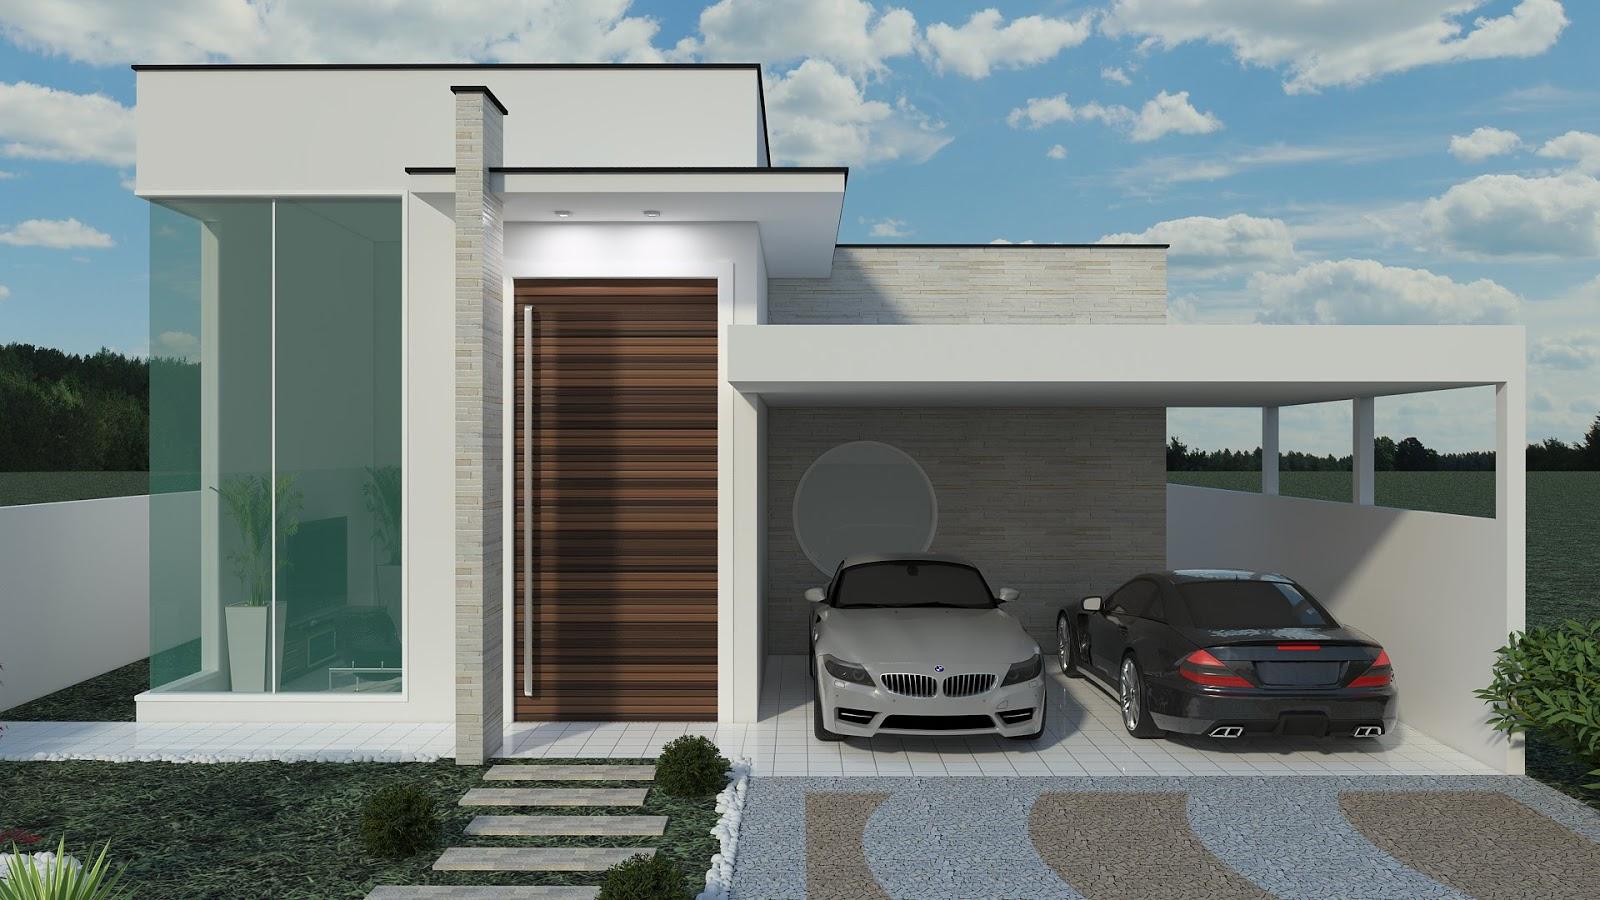 Casas pequenas de dois pisos casas de madeira de dois for Pisos para casas pequenas